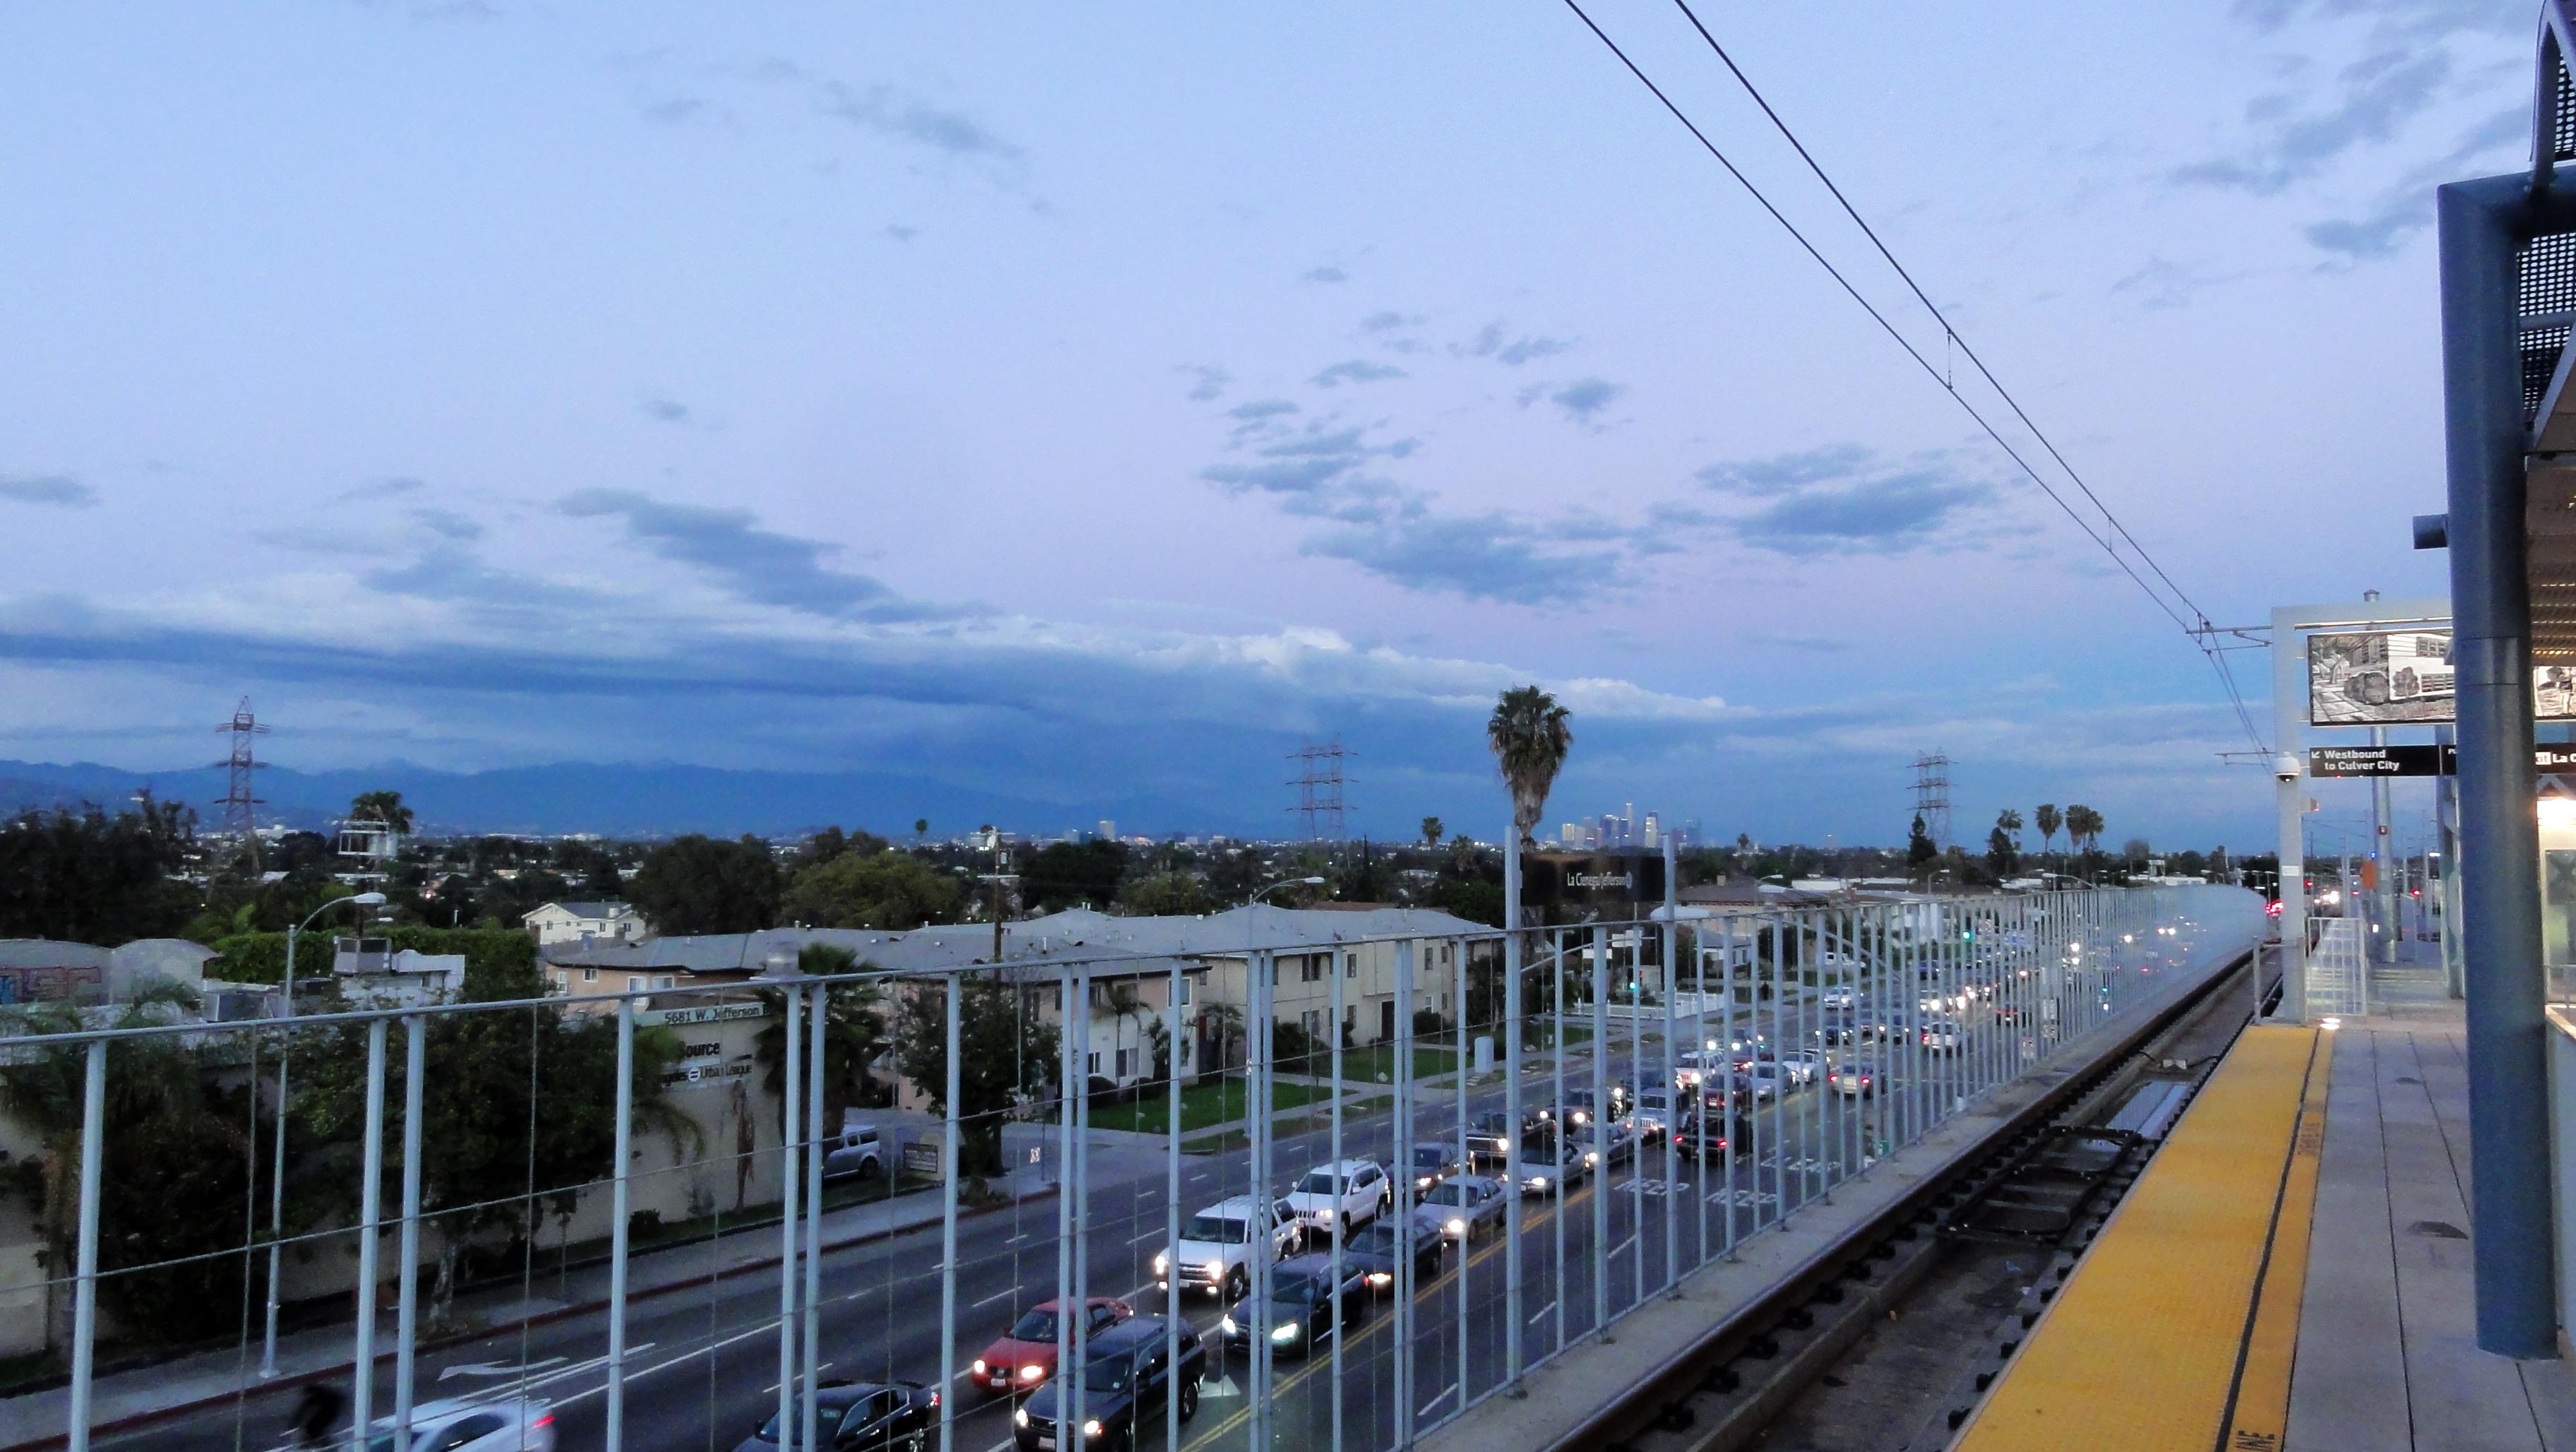 New transit will spark gentrification